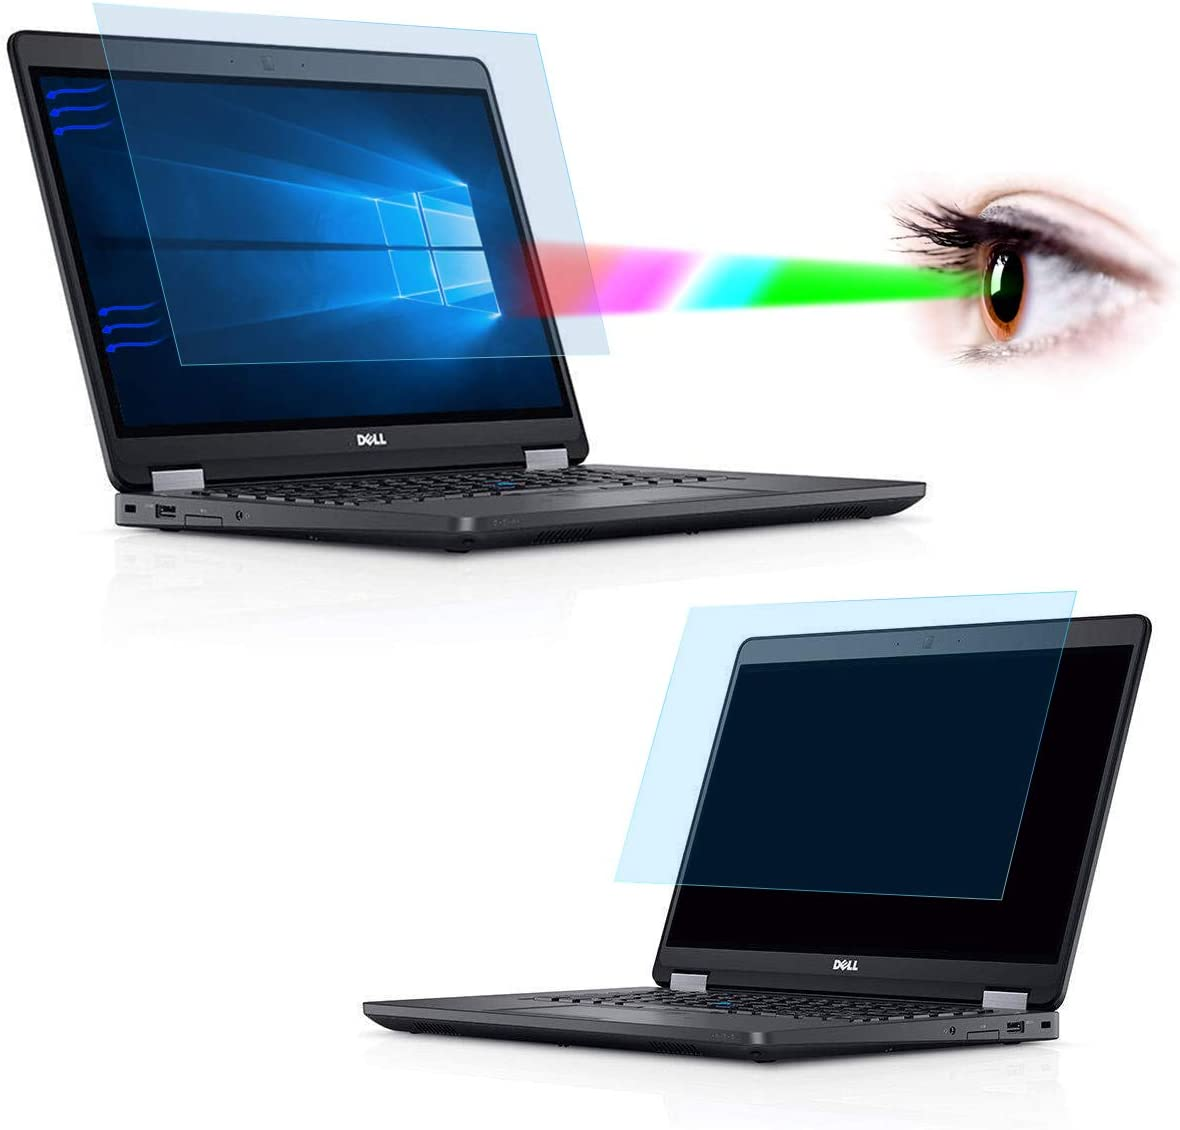 [2 Pack] 14 Inch Screen Protector, Blue Light and Anti Glare Filter Screen Cover for Dell Latitude E7450 E7470 E5470 E7480 5480 5490 7490 14 Inch Laptop Eye Protection Blue Light Blocking Filter